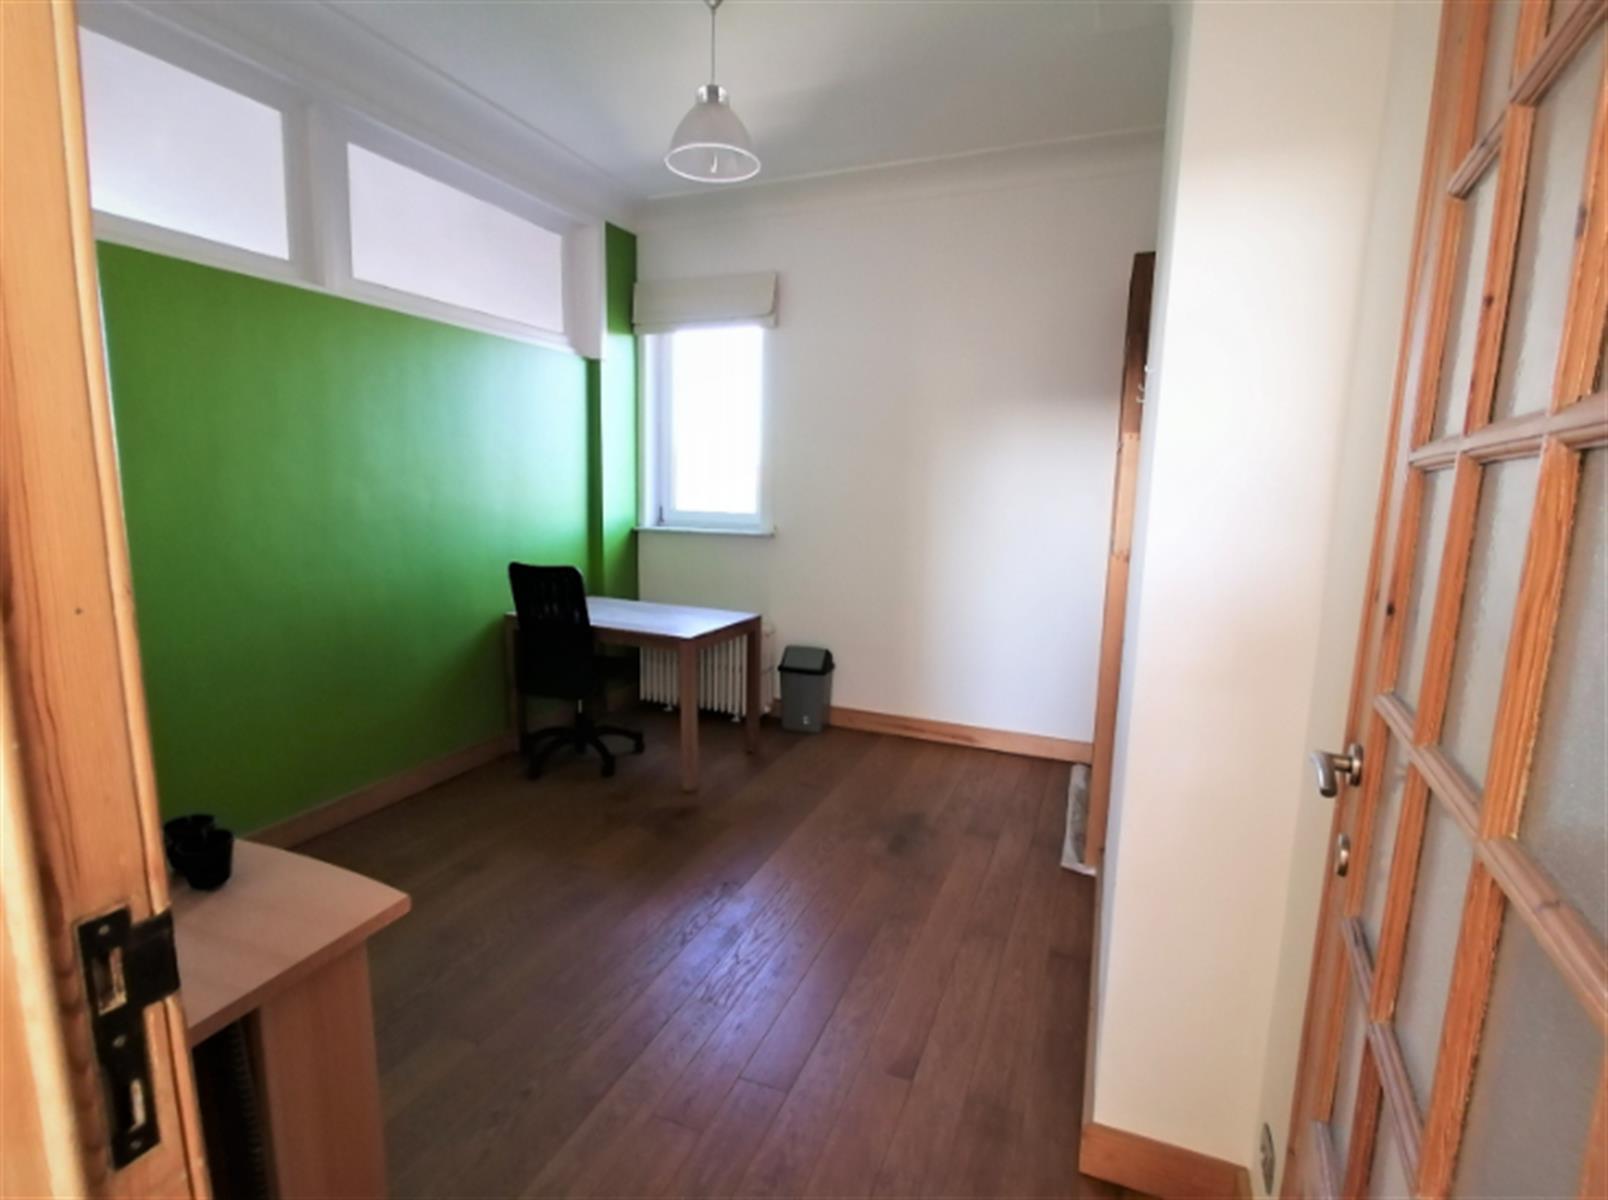 Appartement - Woluwe-Saint-Lambert - #4106440-7